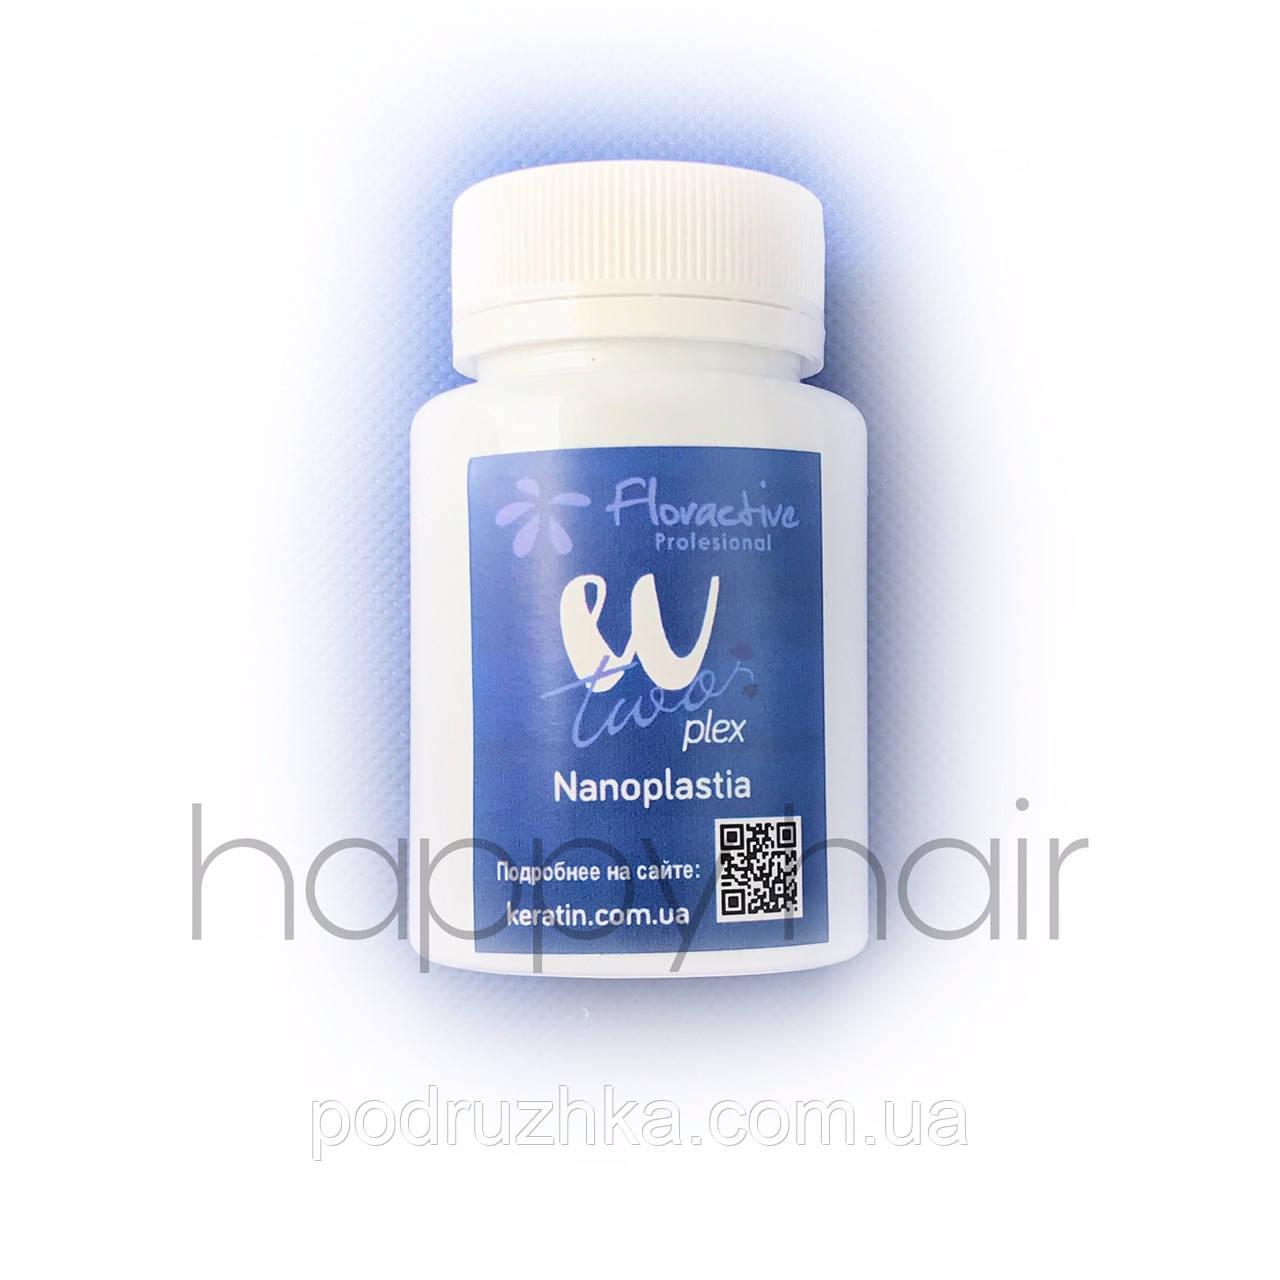 Нанопластика для блонда Floractive W.Two Plex 100 г